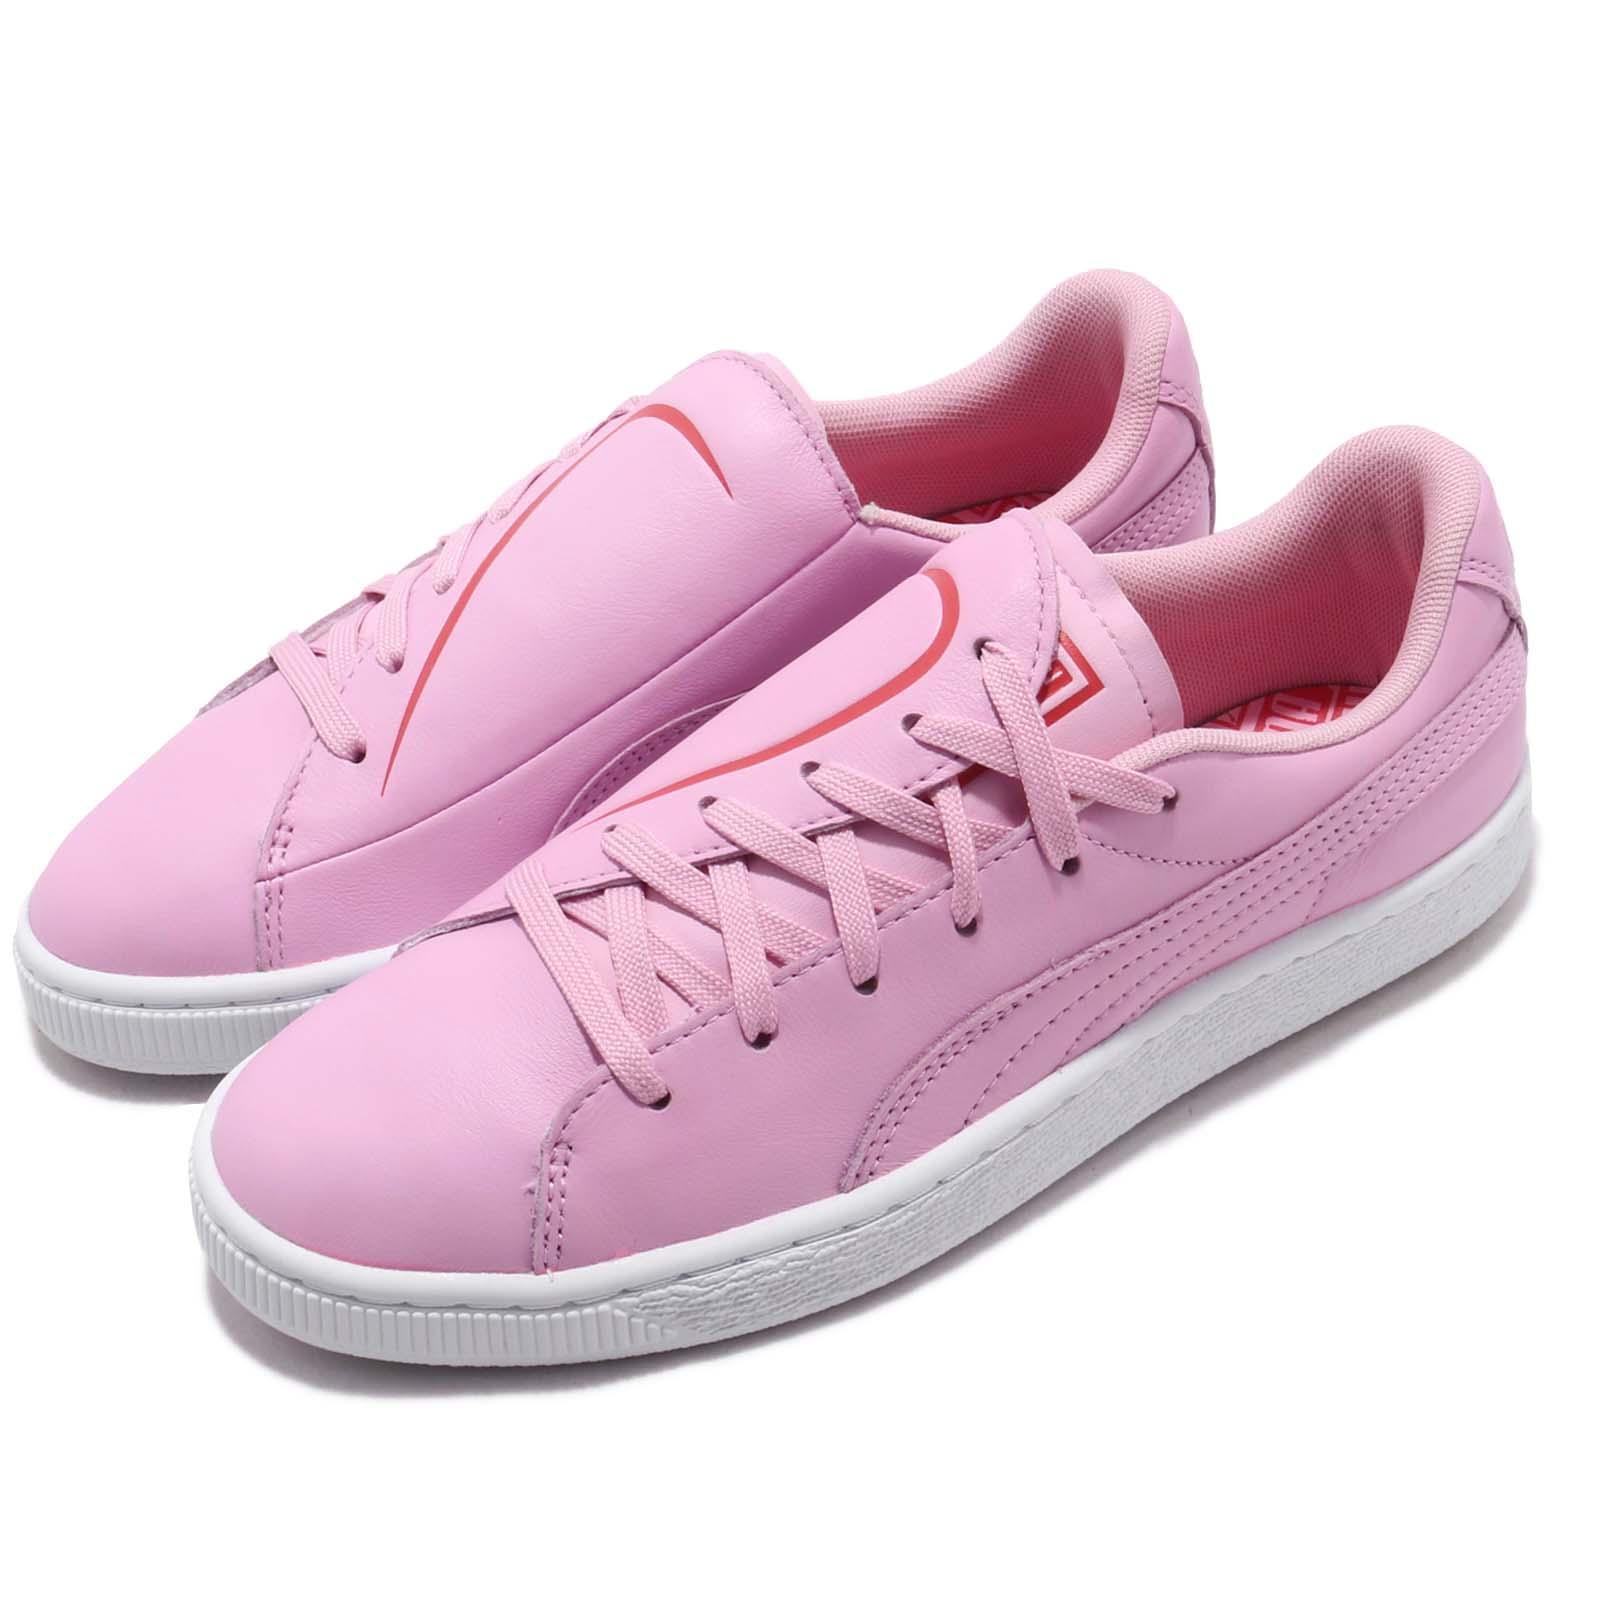 Puma 休閒鞋 Basket Crush 低筒 女鞋 36959503